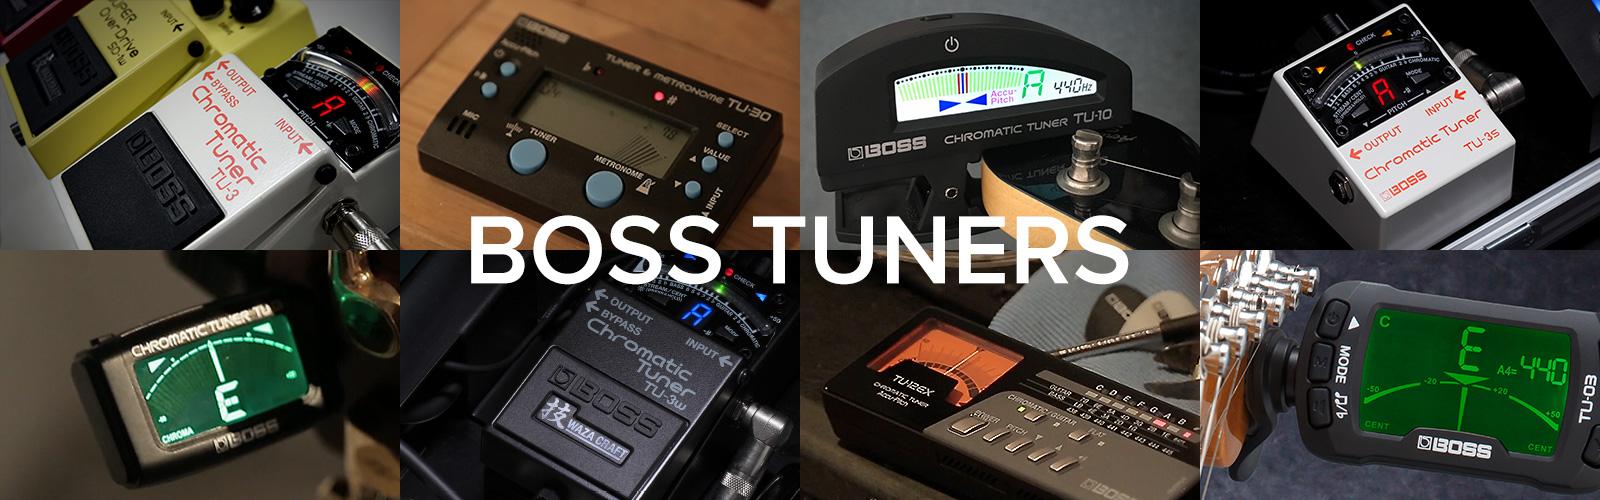 BOSS Tuners